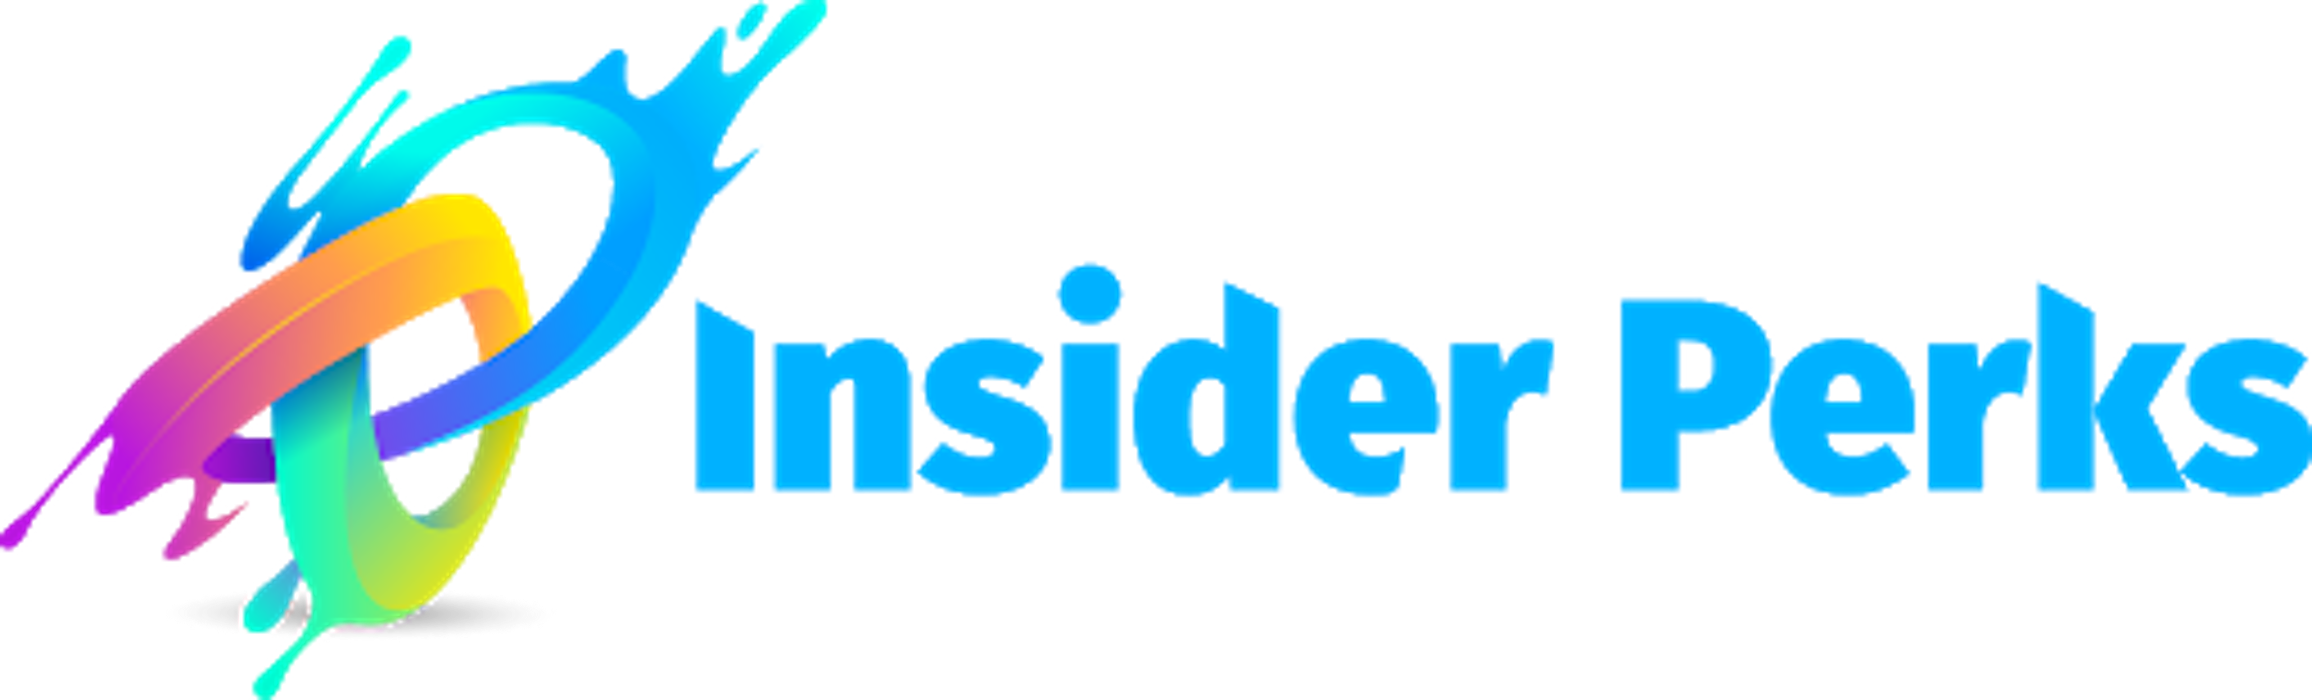 Insider Perks - Cleveland, OH